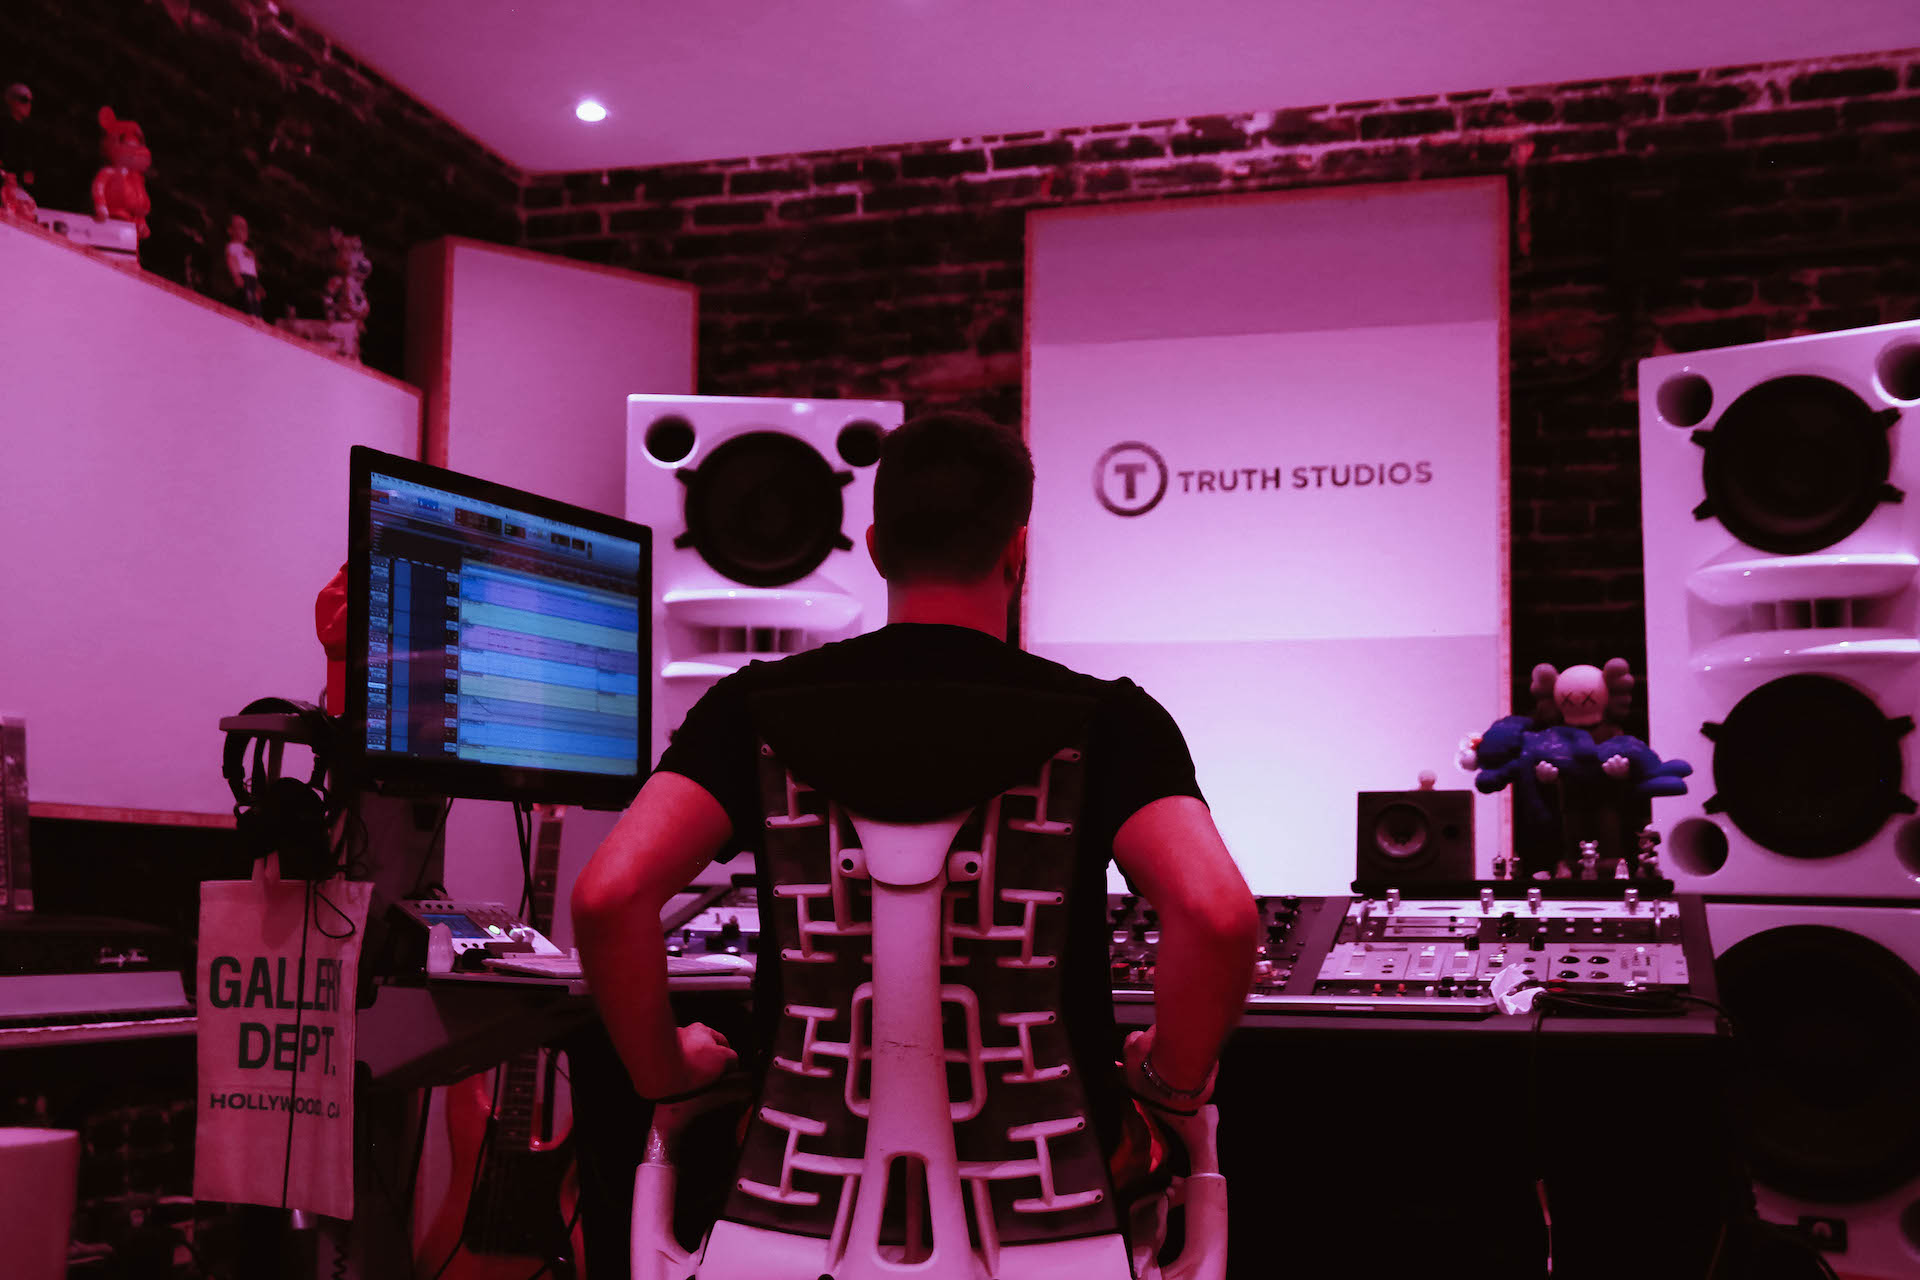 Nick Breton Mixing at Truth Studios